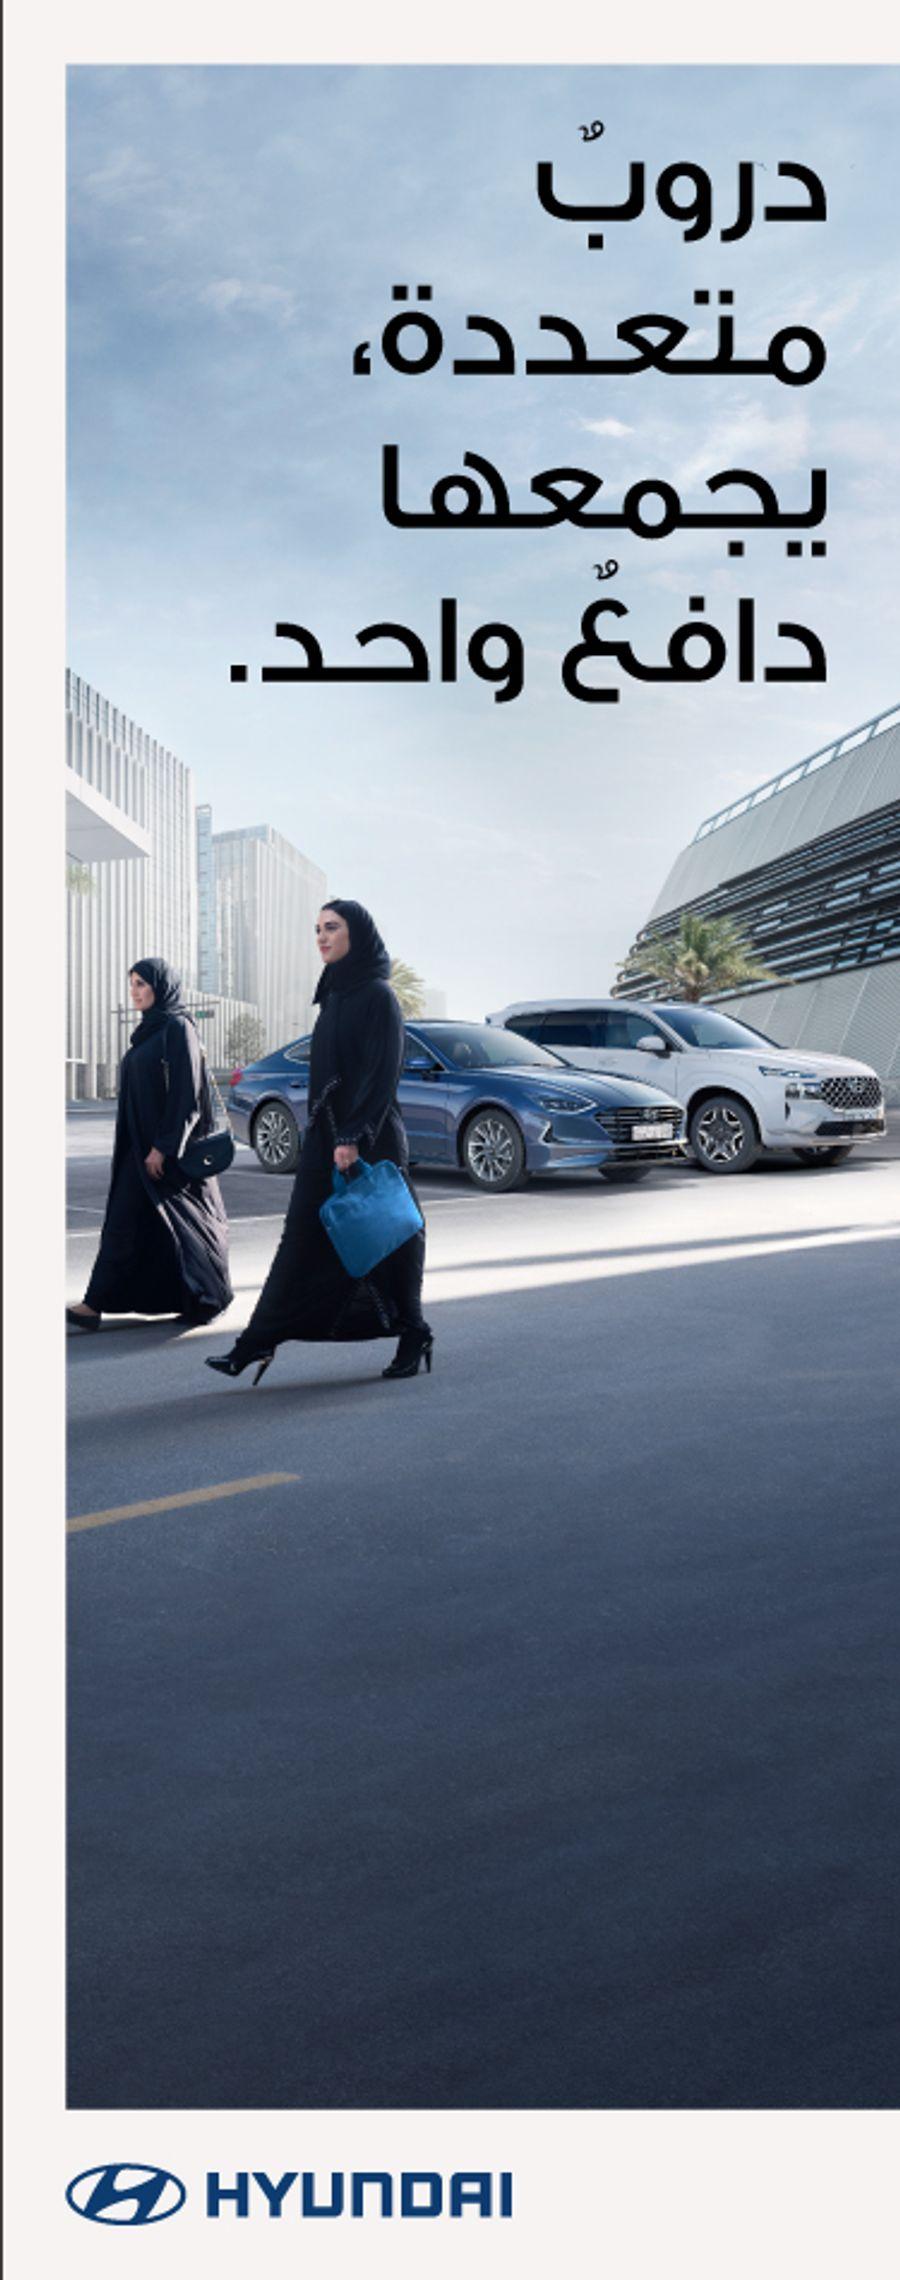 Hyundai Saudi Woman Campaign